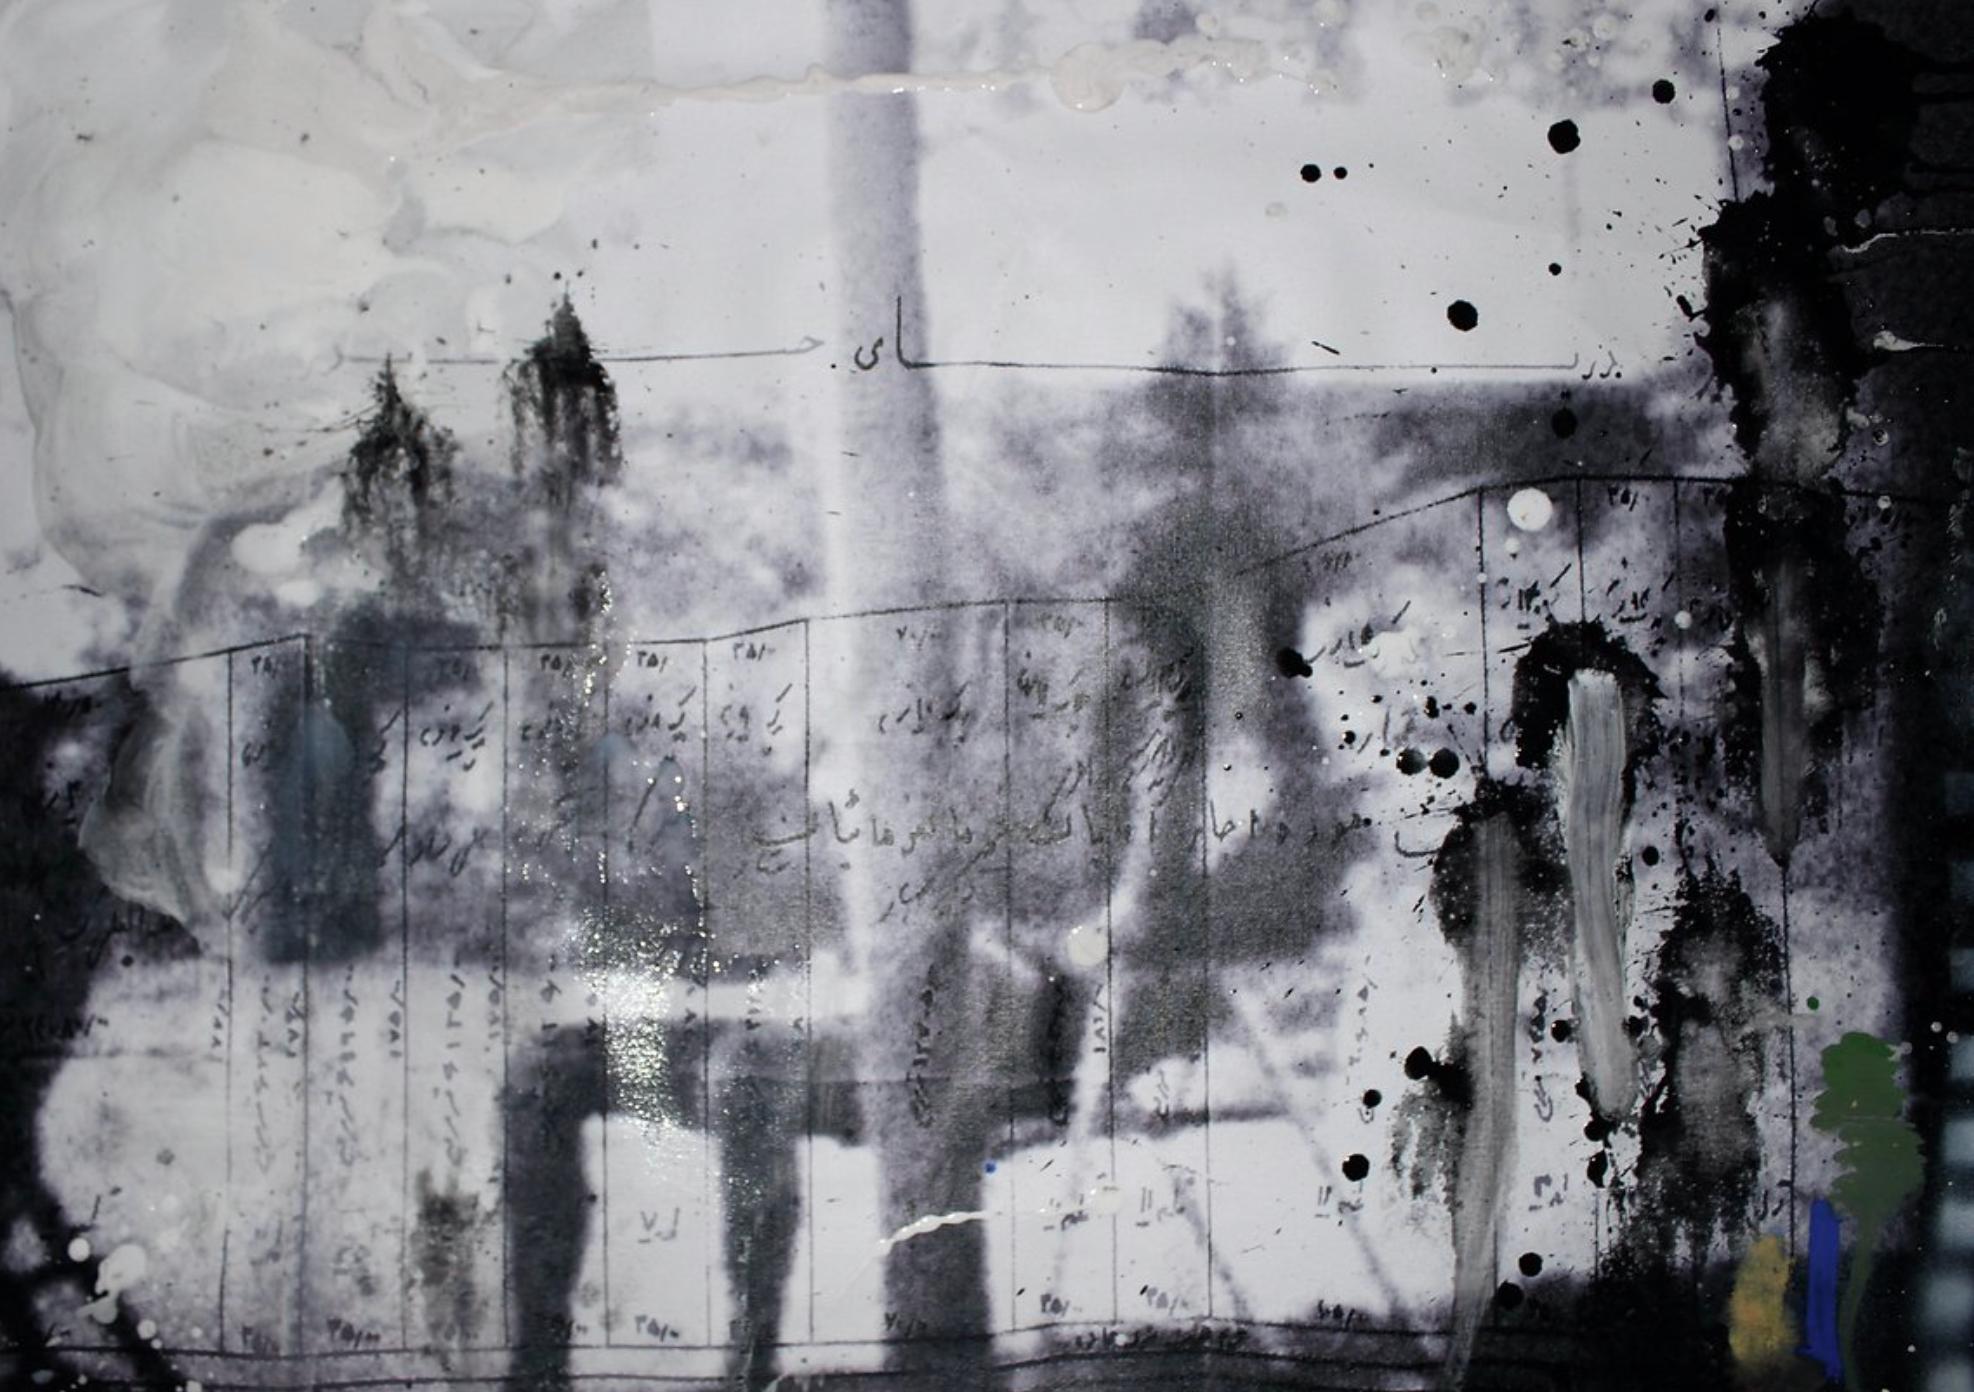 Firouz Farmanfarmaian, Summer at the Caspian II Part III, acrylic and print on photo paper, 70 x 100 cm, 2015